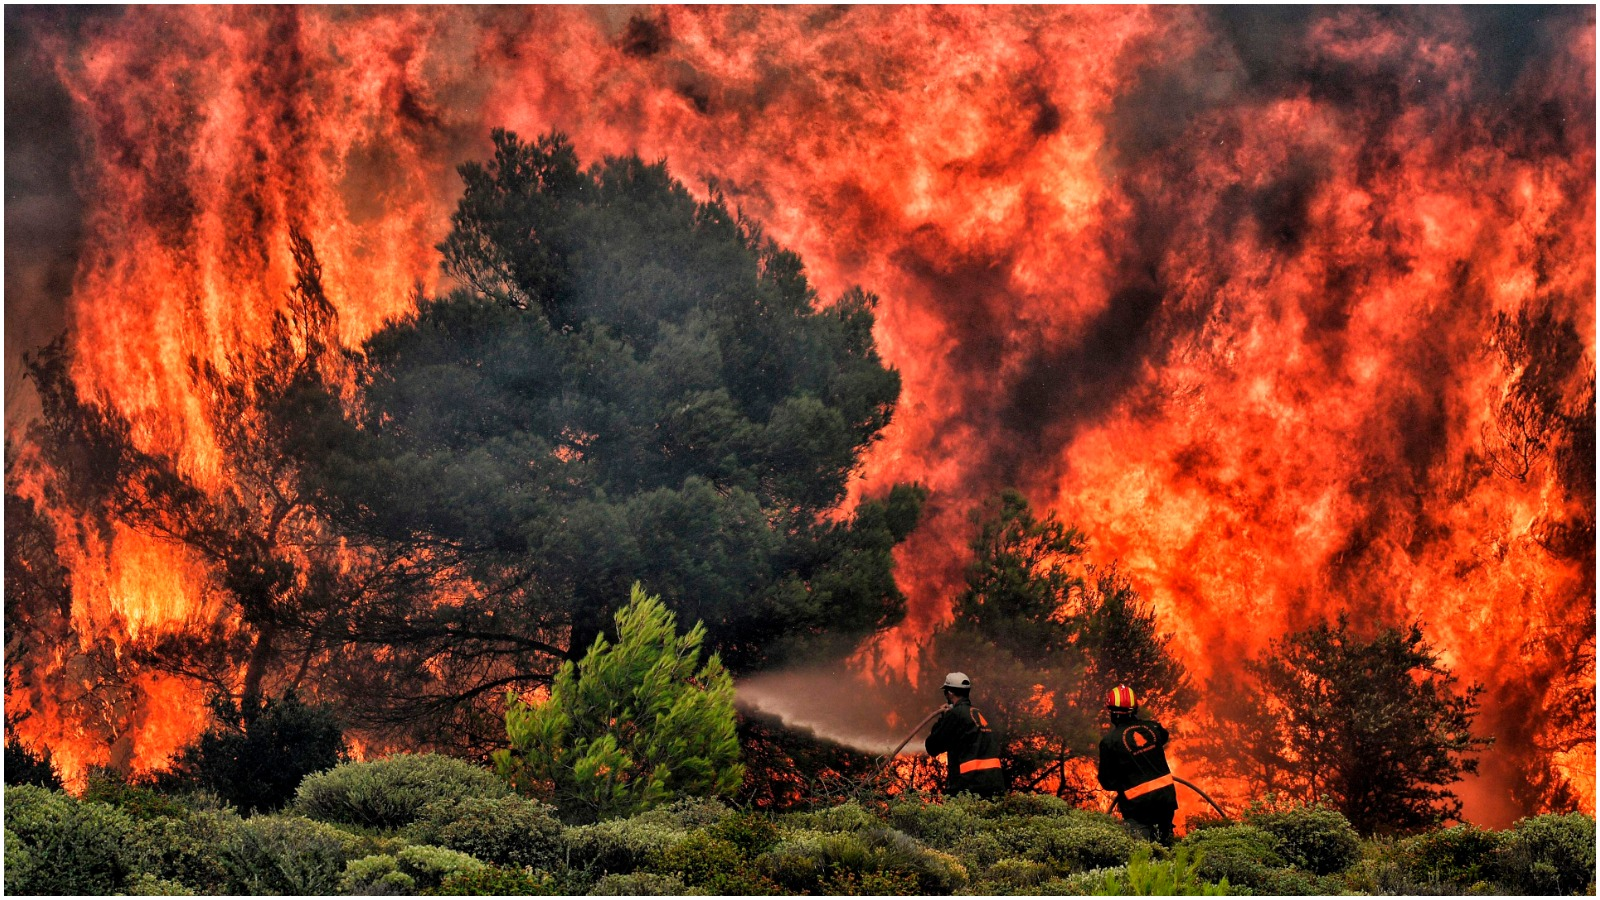 Maria Reumert Gjerding (DNF): Tørken og varmen fortæller os, at forandringerne i klodens klima er i fuld gang